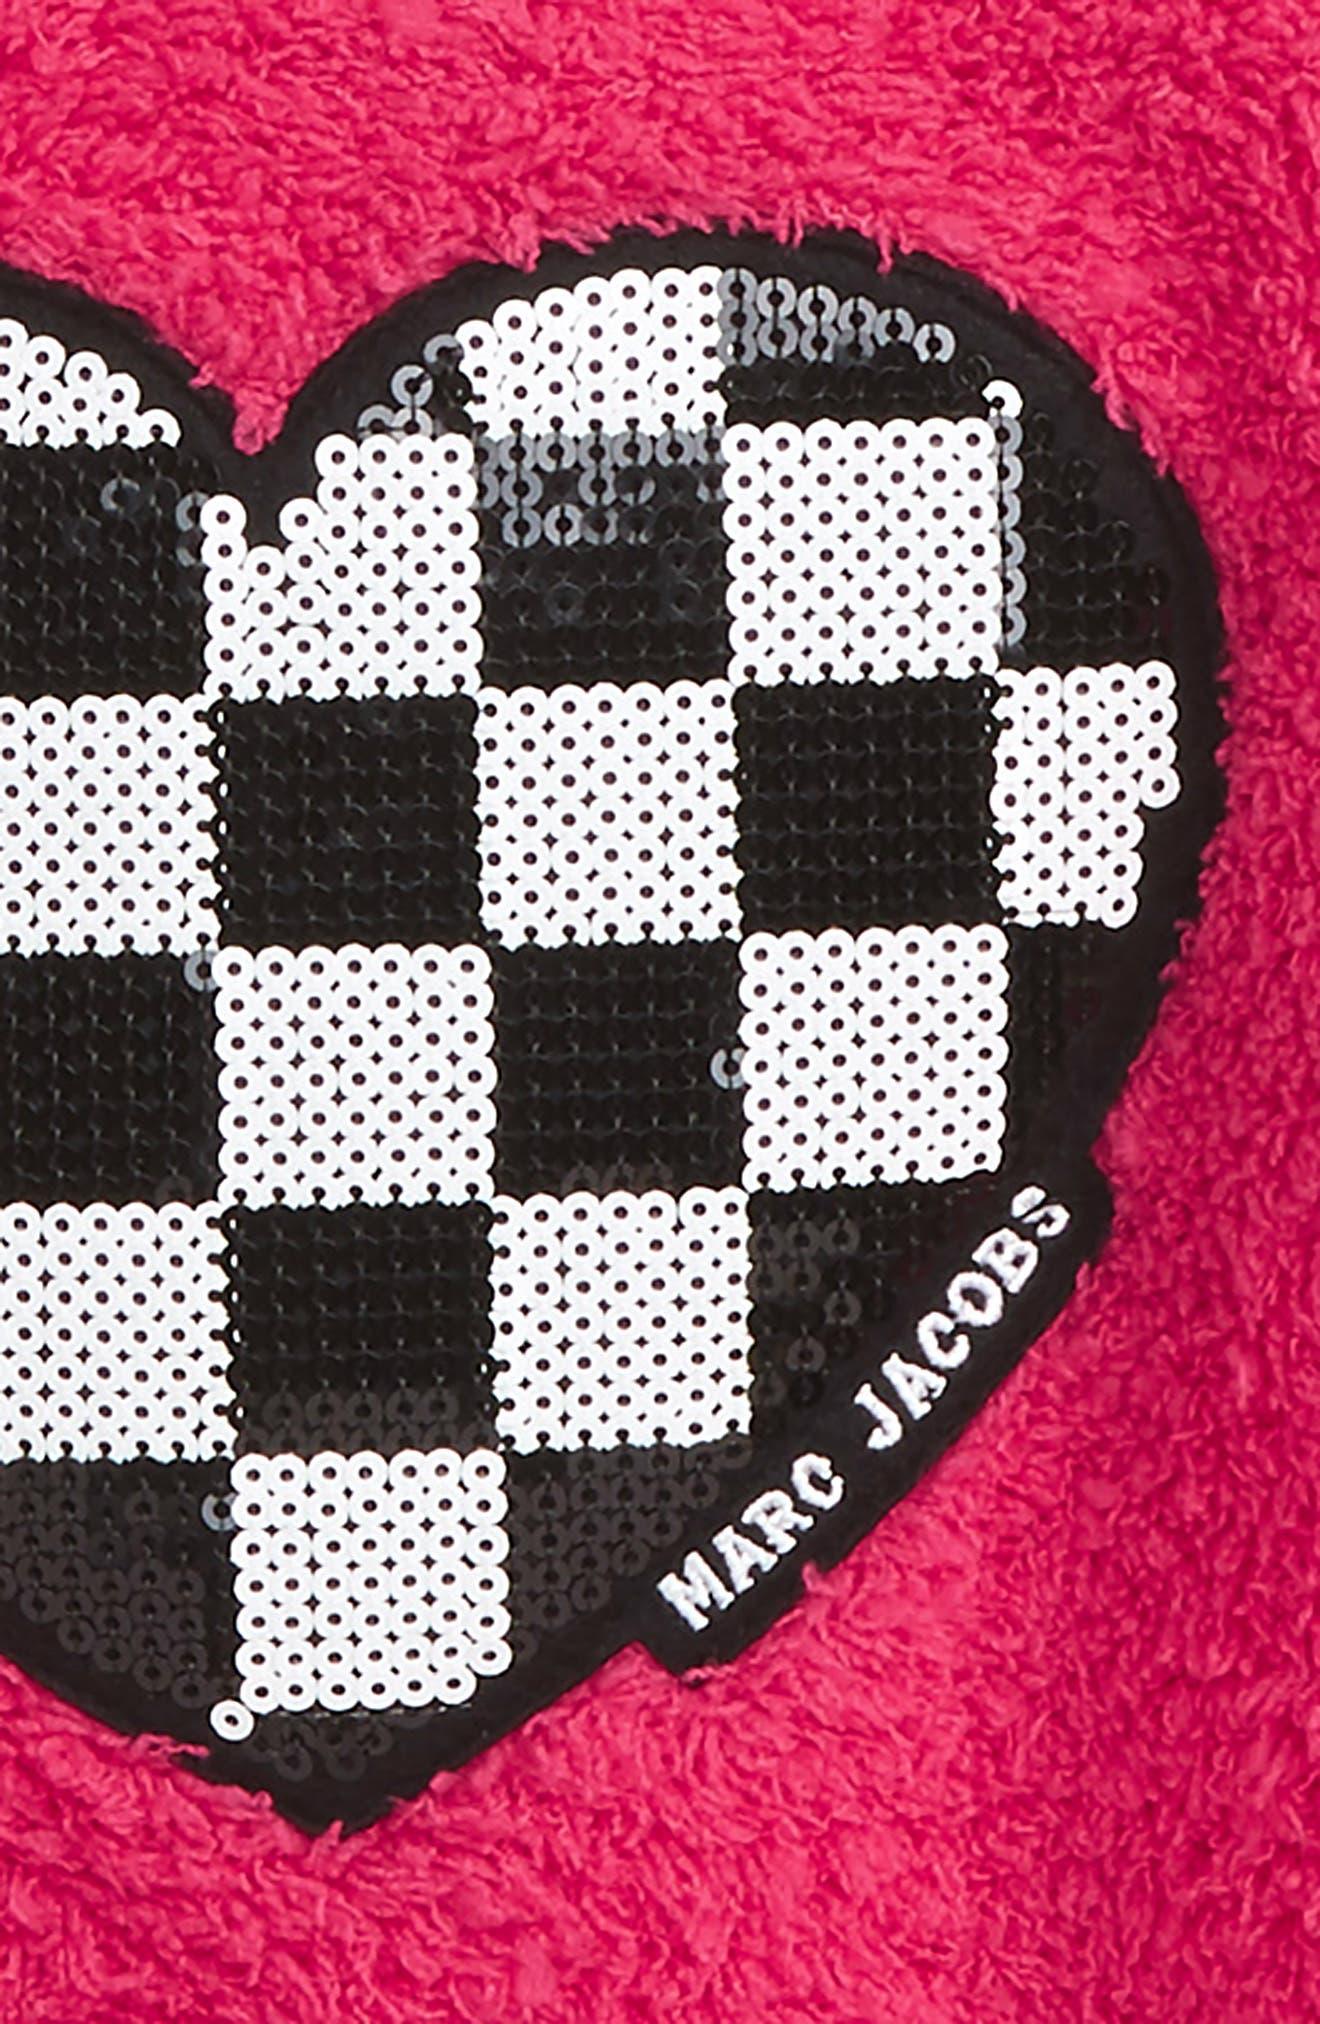 Sequin Heart Fuzzy Sweatshirt,                             Alternate thumbnail 2, color,                             670